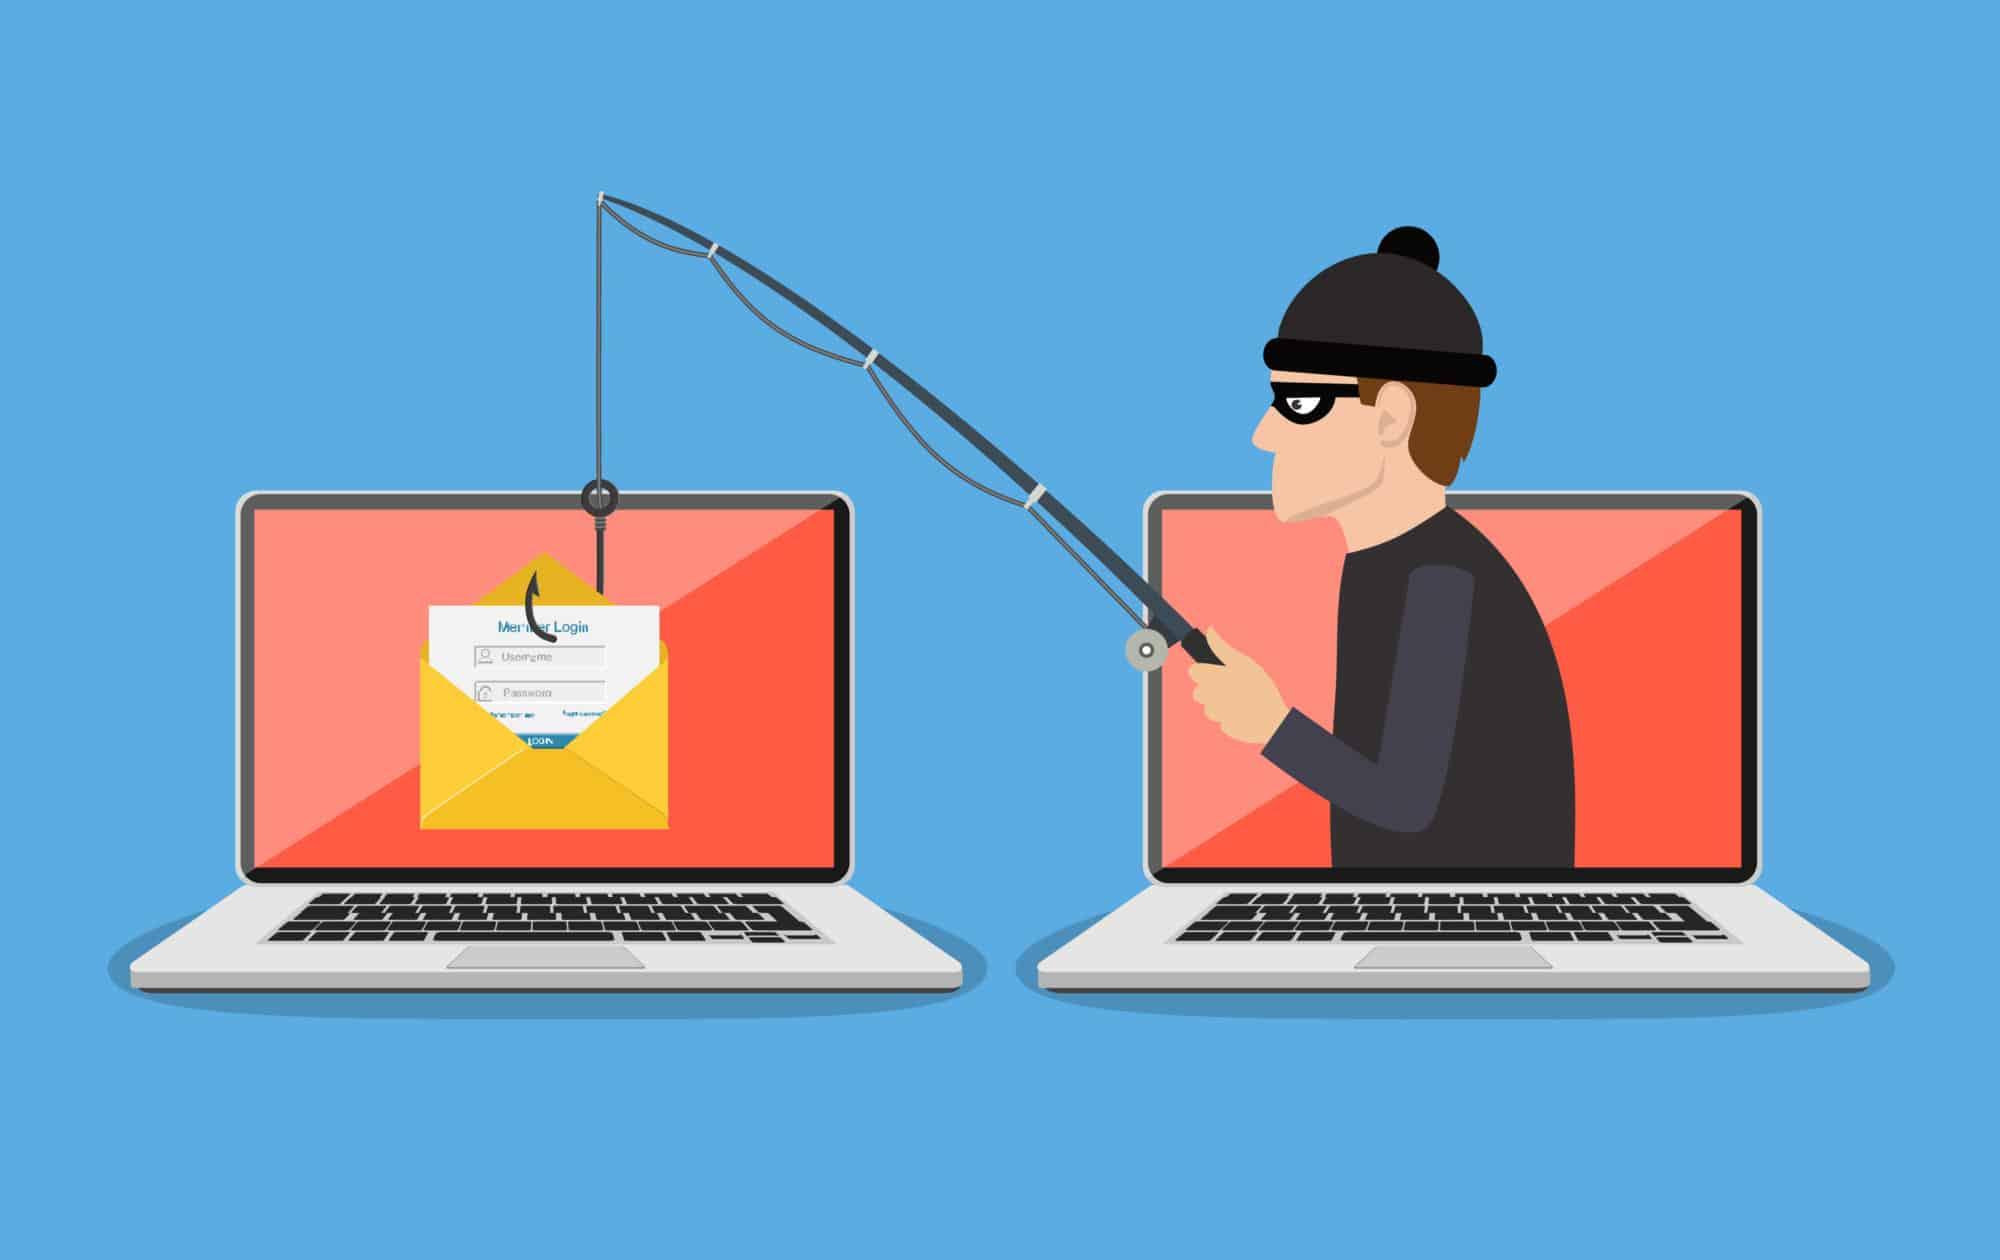 Avoiding Deceptive Phishing Emails